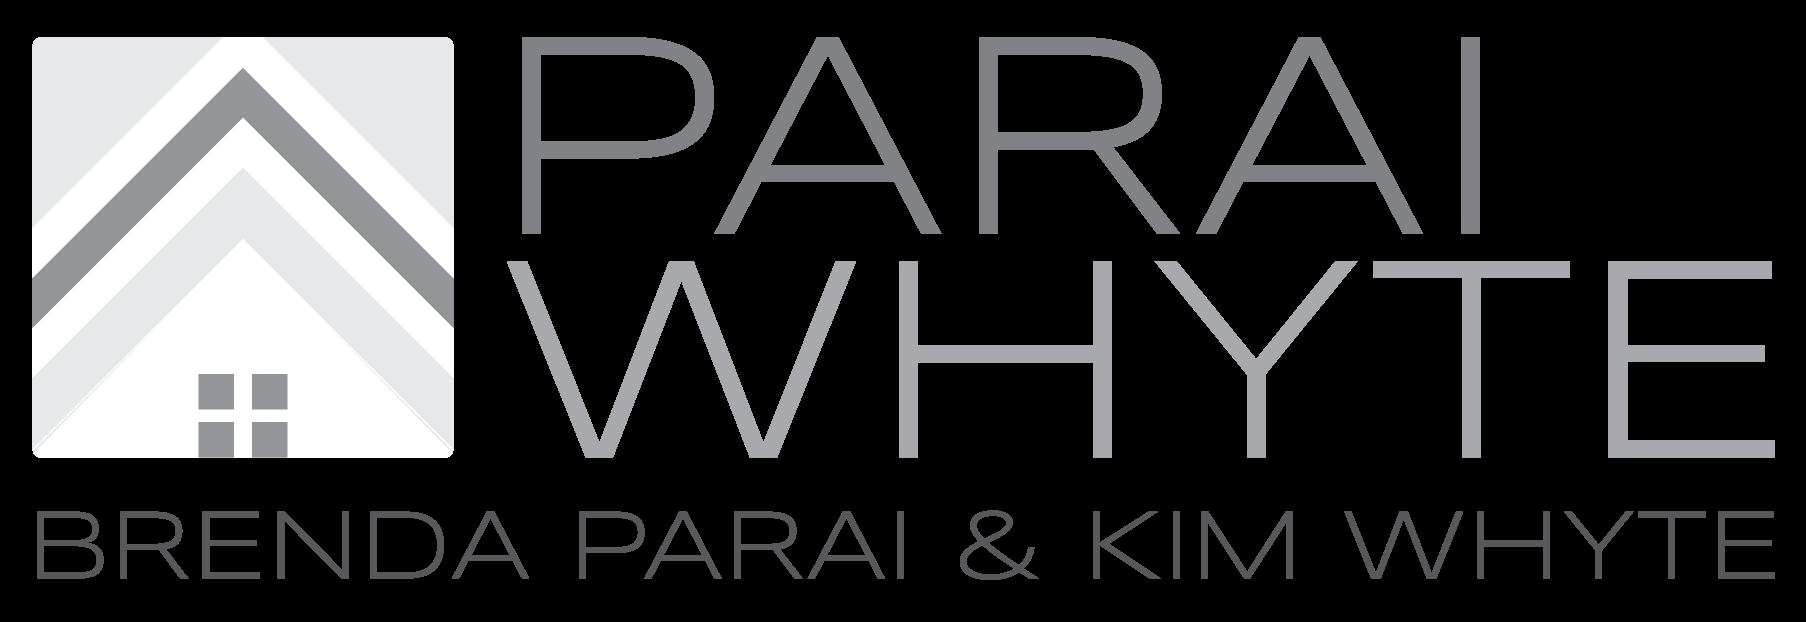 Brenda Parai and Kim Whyte - Calgary Real Estate Agents